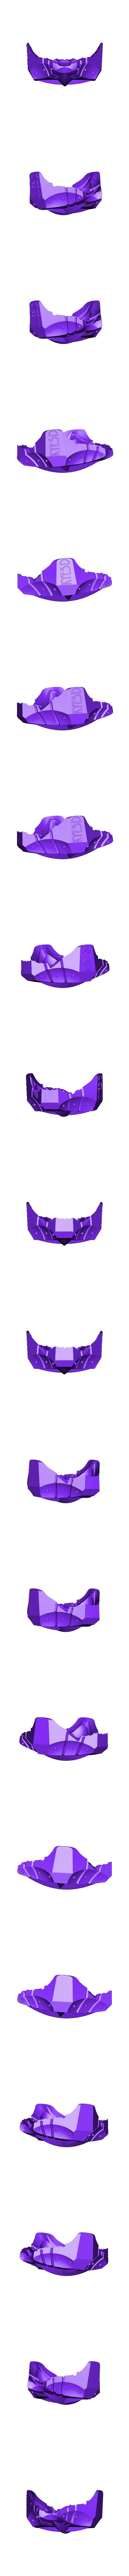 Onyx_Mask.stl Download free STL file Onyx VR Pendant  • 3D printable design, KYE3D